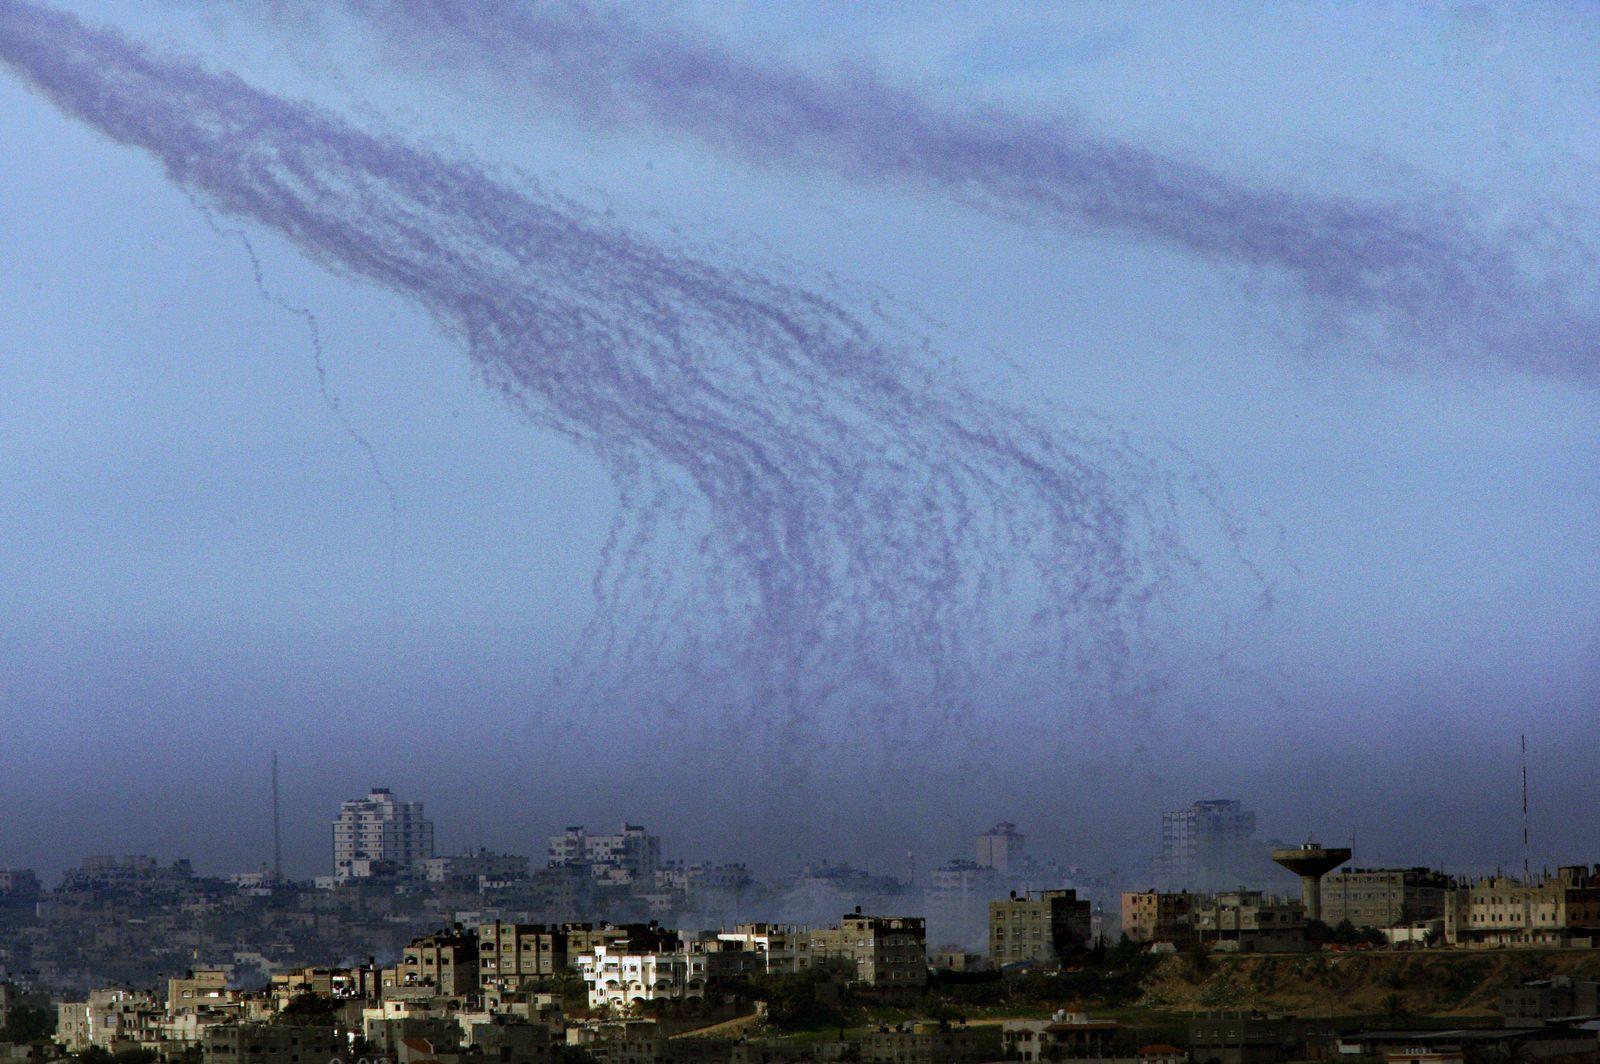 Gaza / Kriegsverbrechen / Israel / Streubomben #2